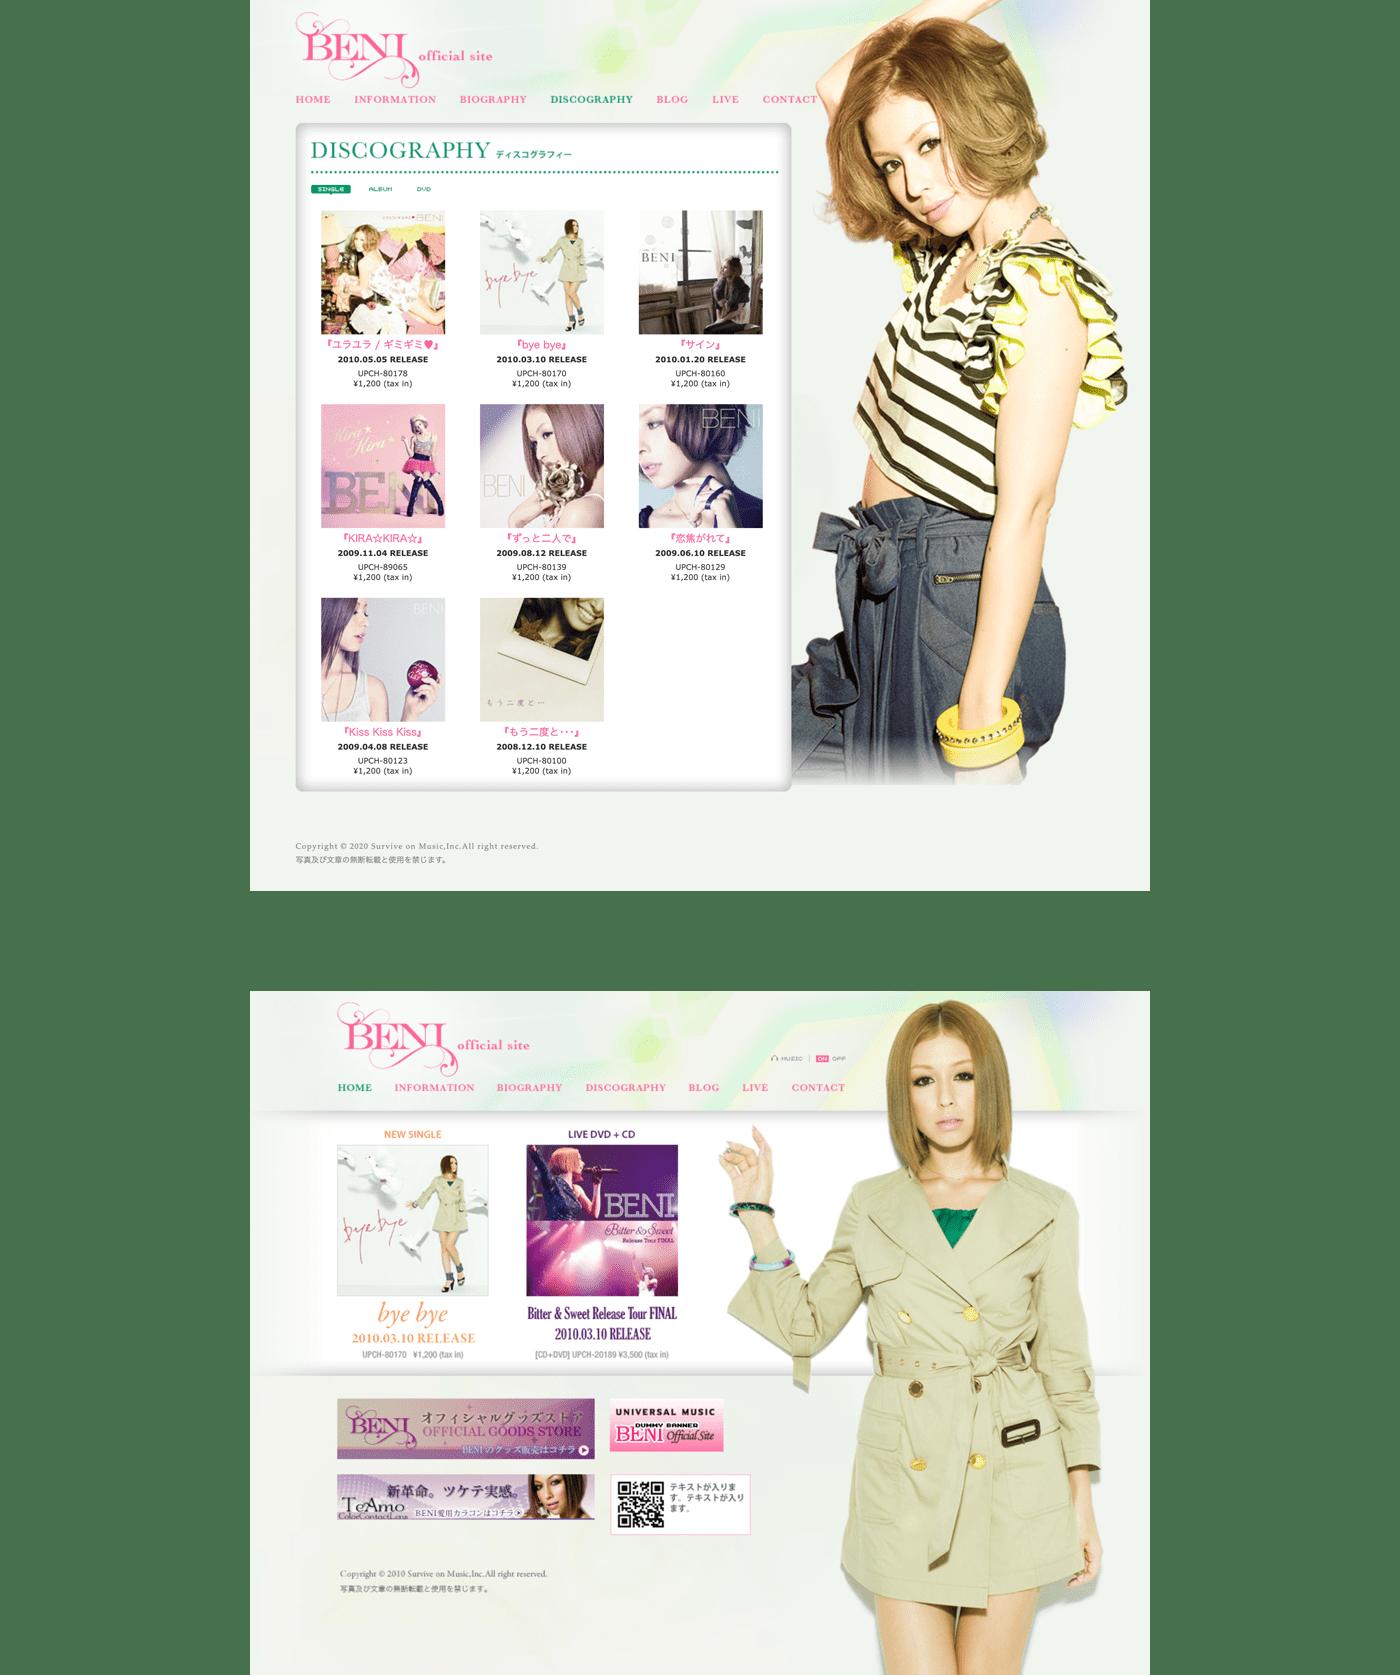 BENI Official Site Design